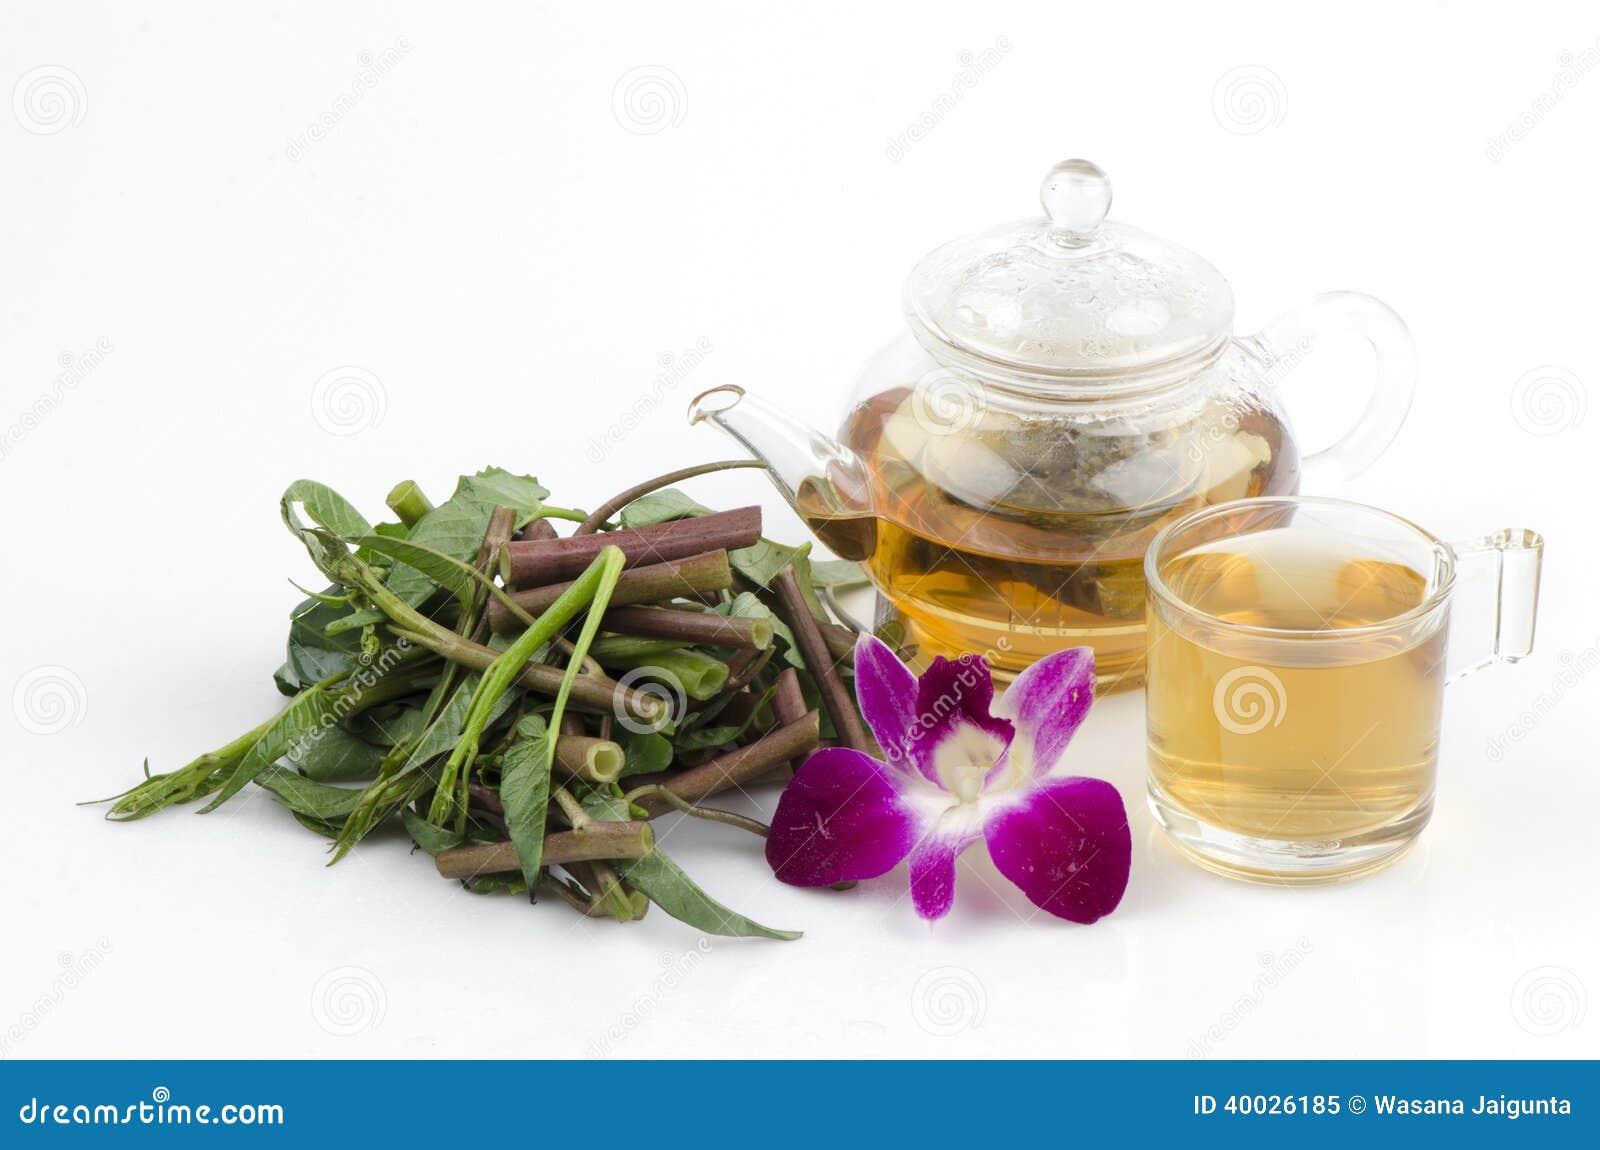 ... morning-glory-ipomoea-aquatica-forsk-tea-tea-tea-tea-heath-40026185